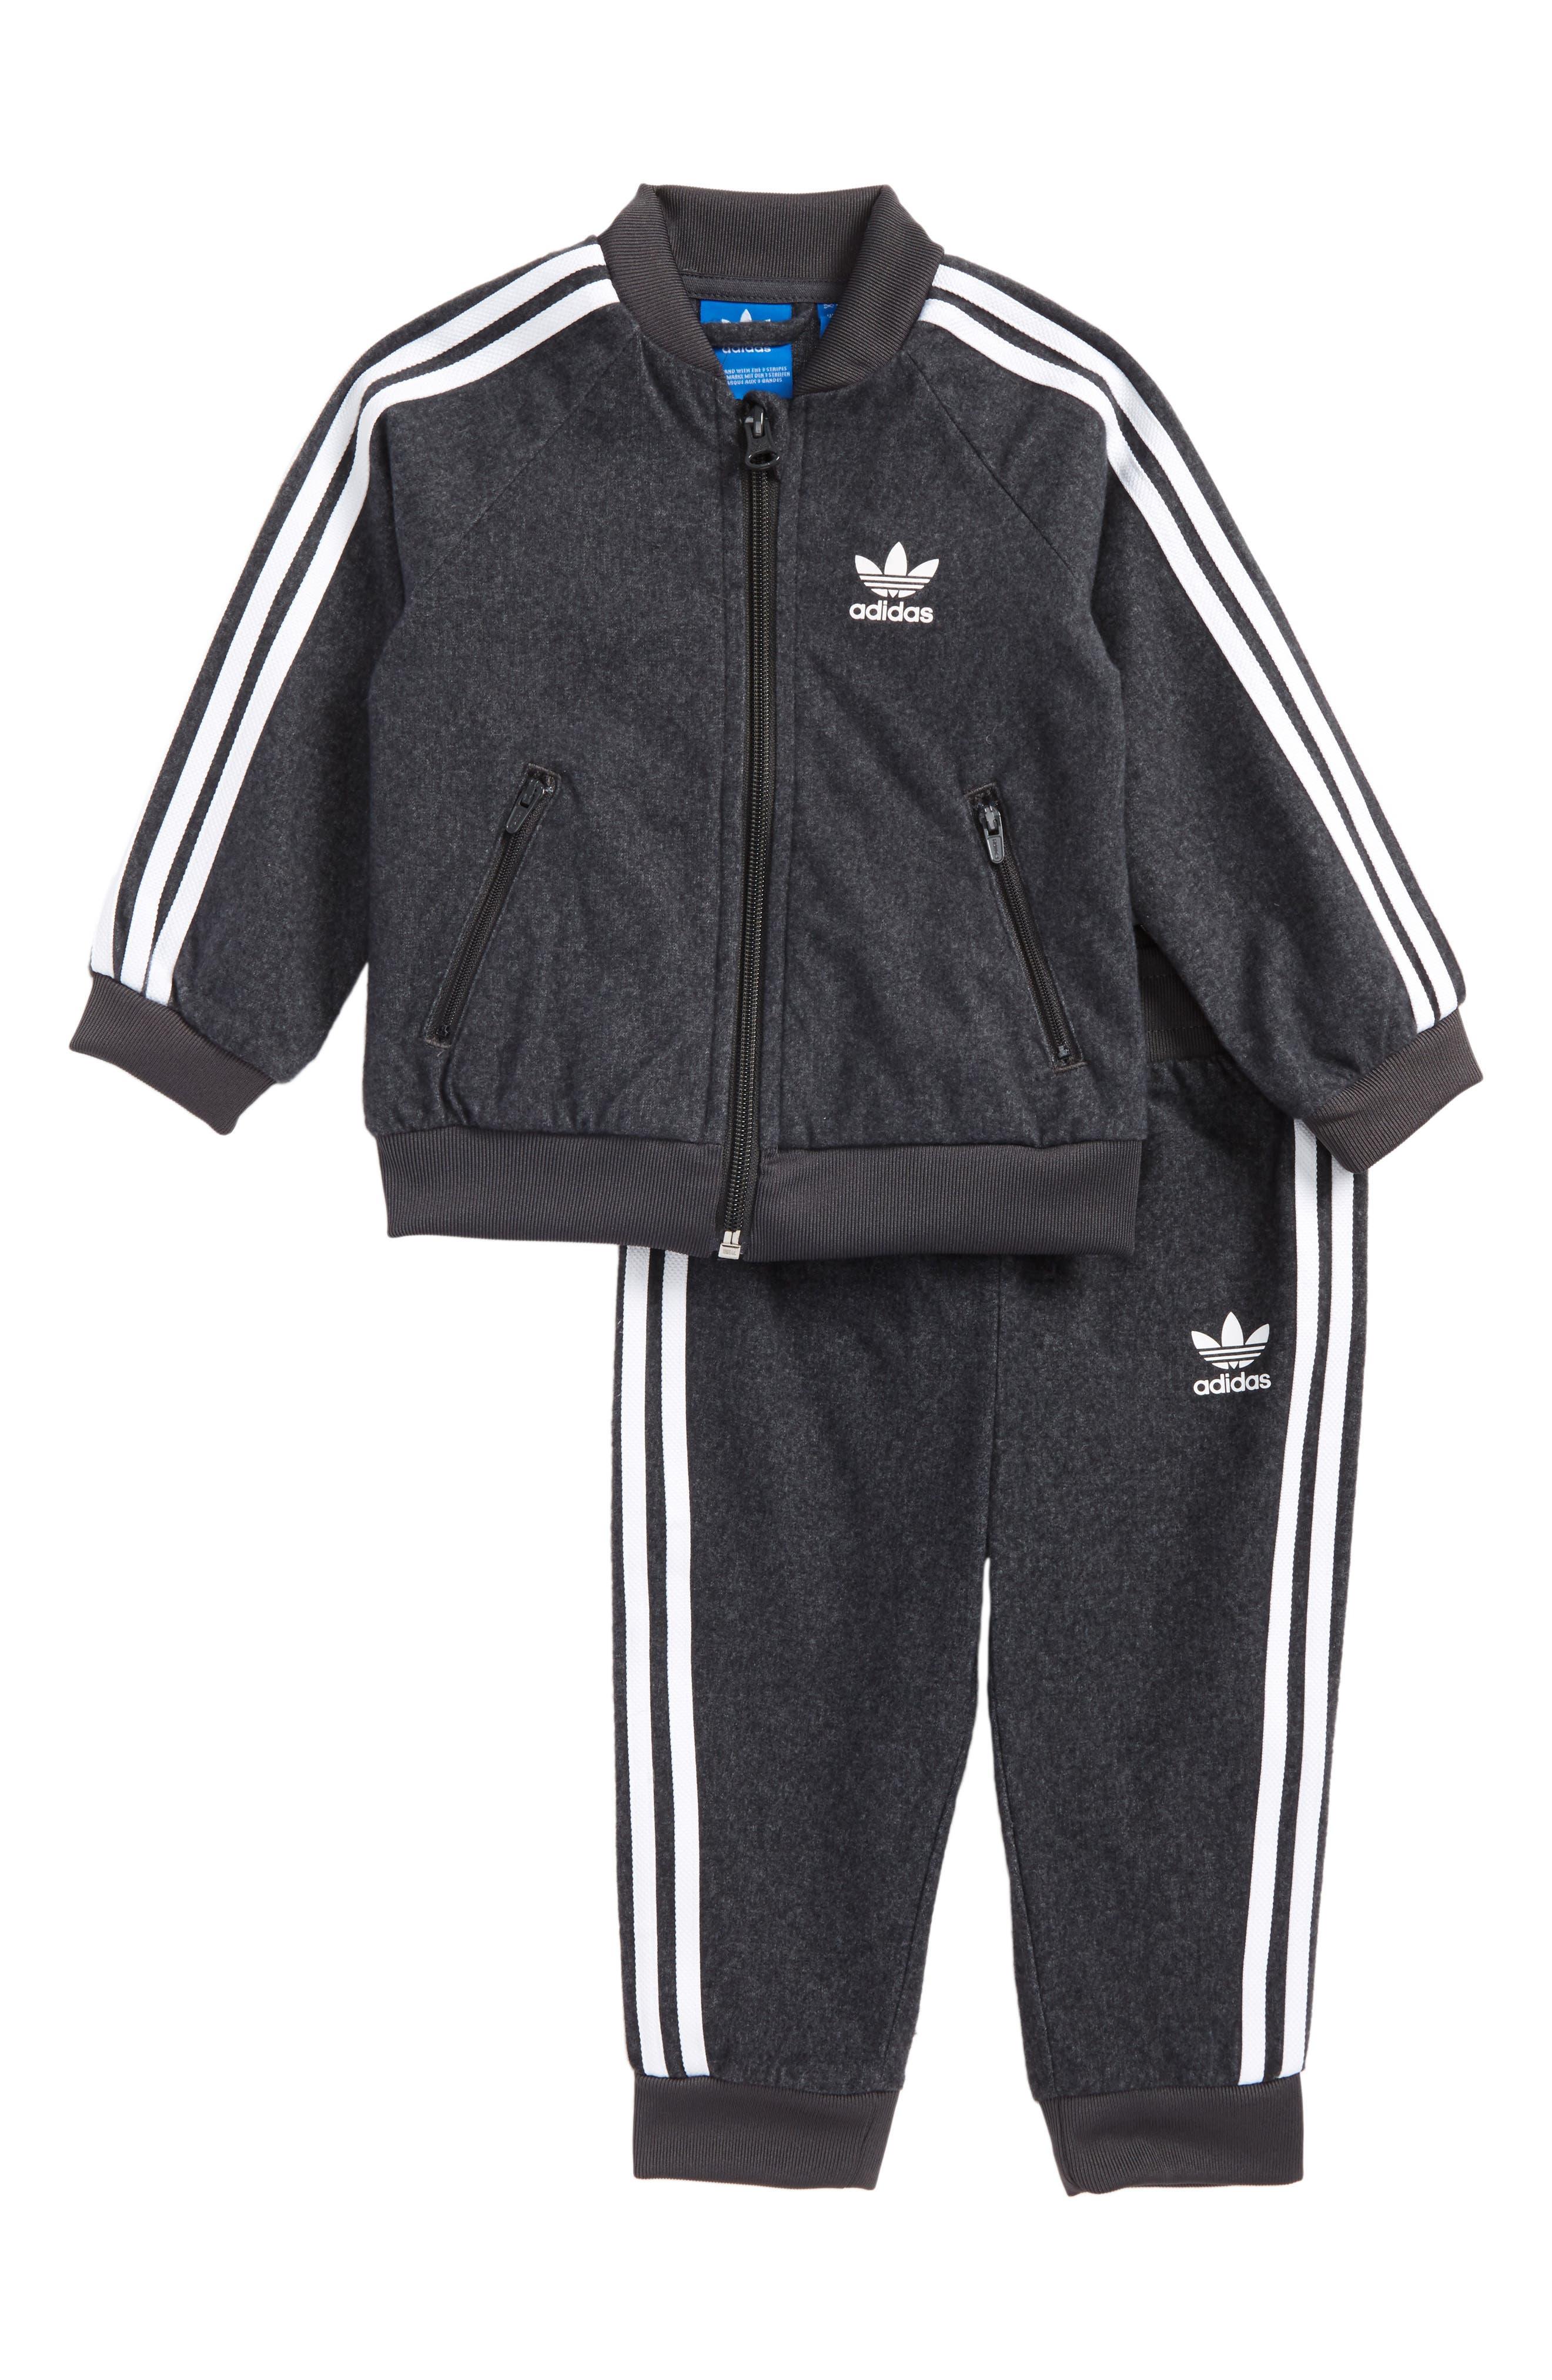 Main Image - adidas Originals Superstar Twill Track Jacket & Pants Set (Baby Boys)